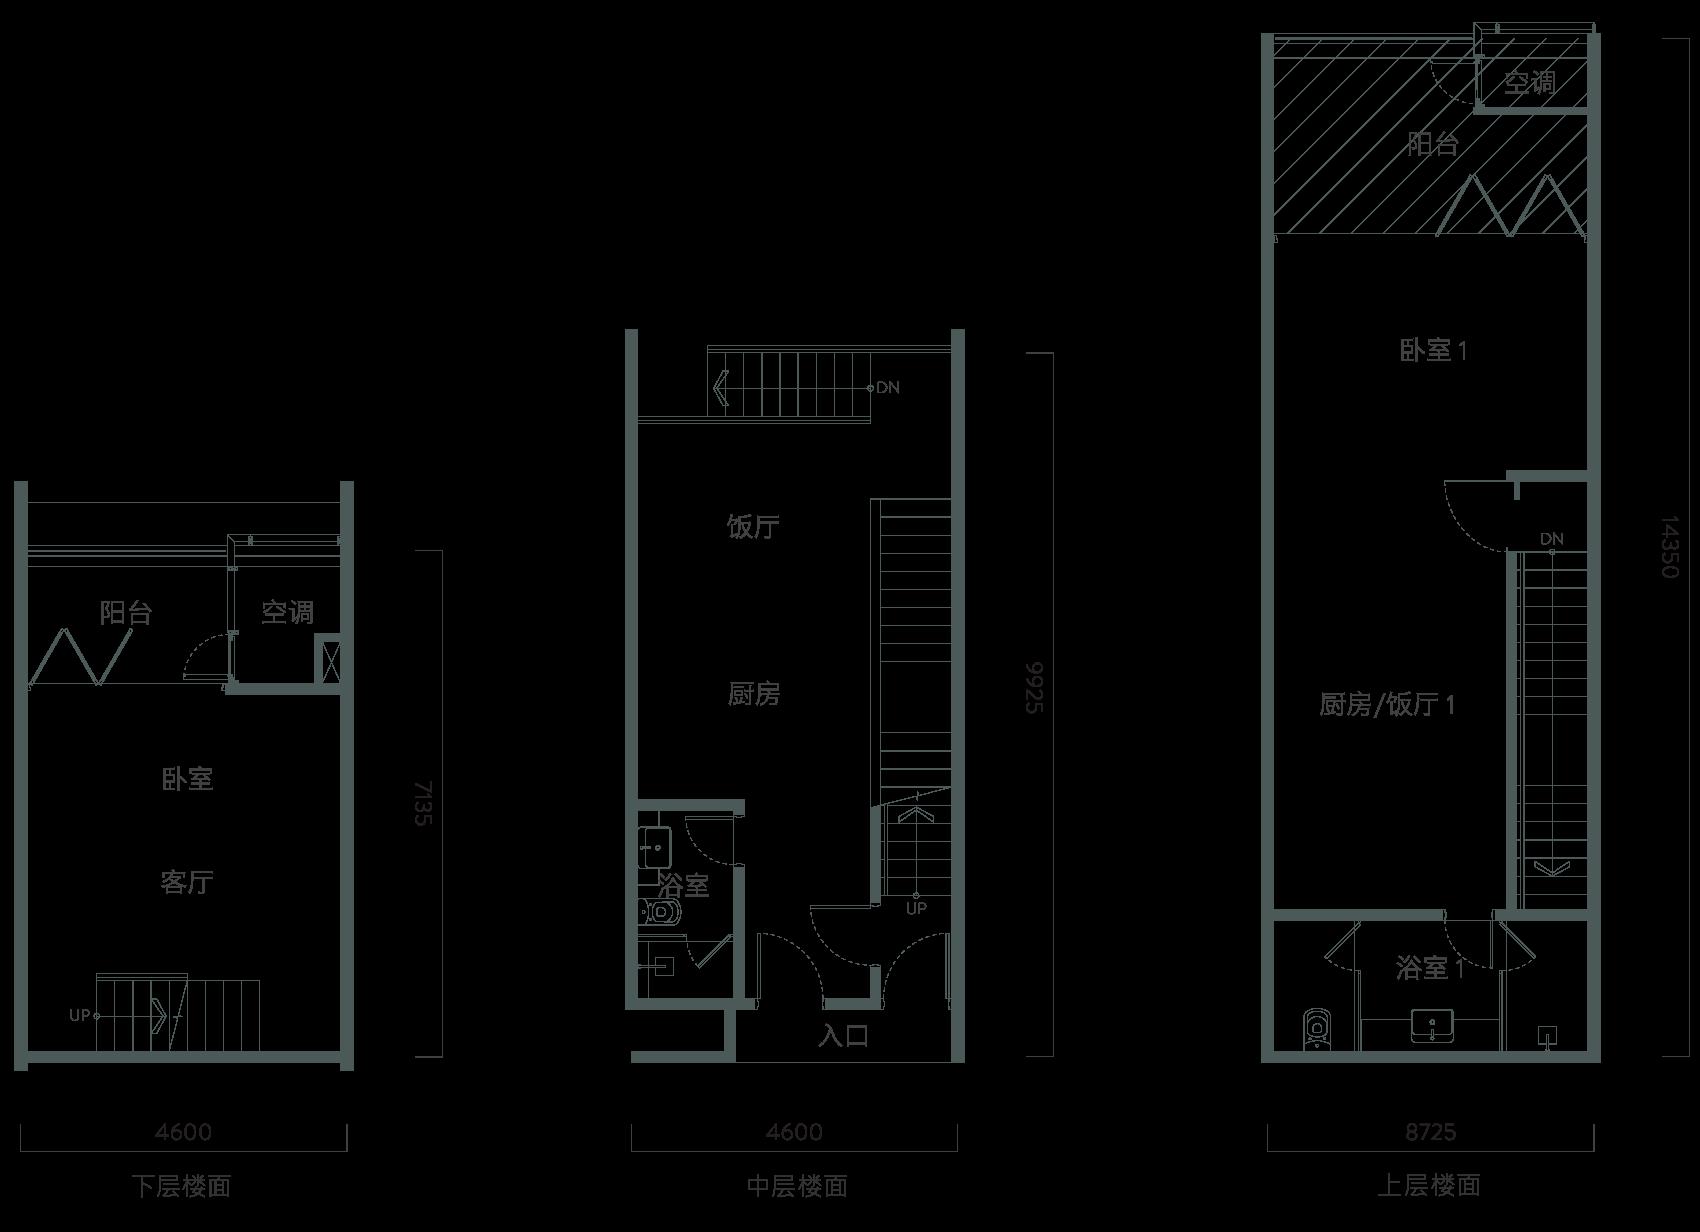 TS4 Floorplan